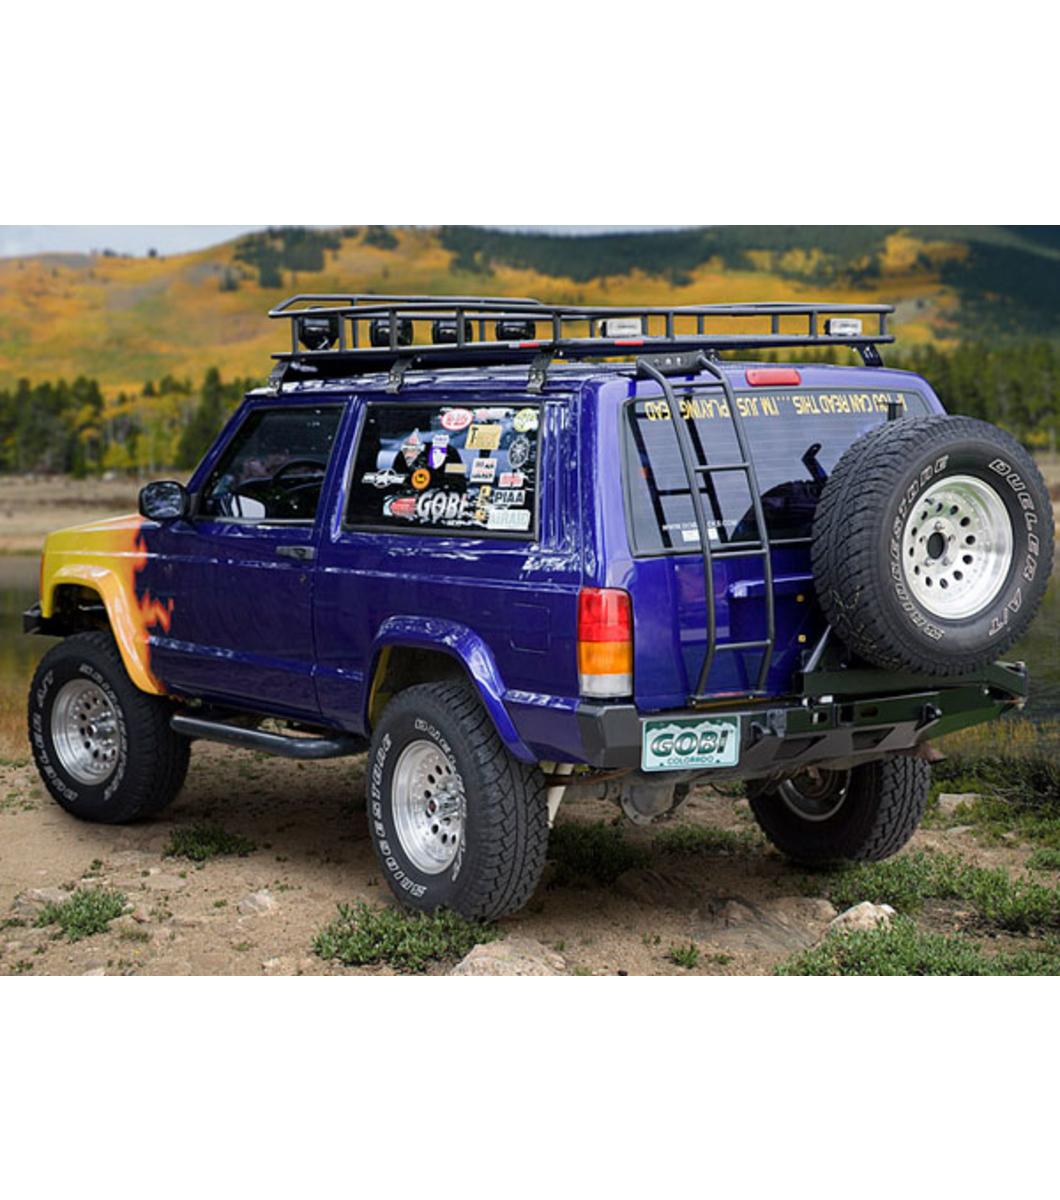 Gobi Jeep Cherokee Xj Ranger Rack No Sunroof Multi Light Setup